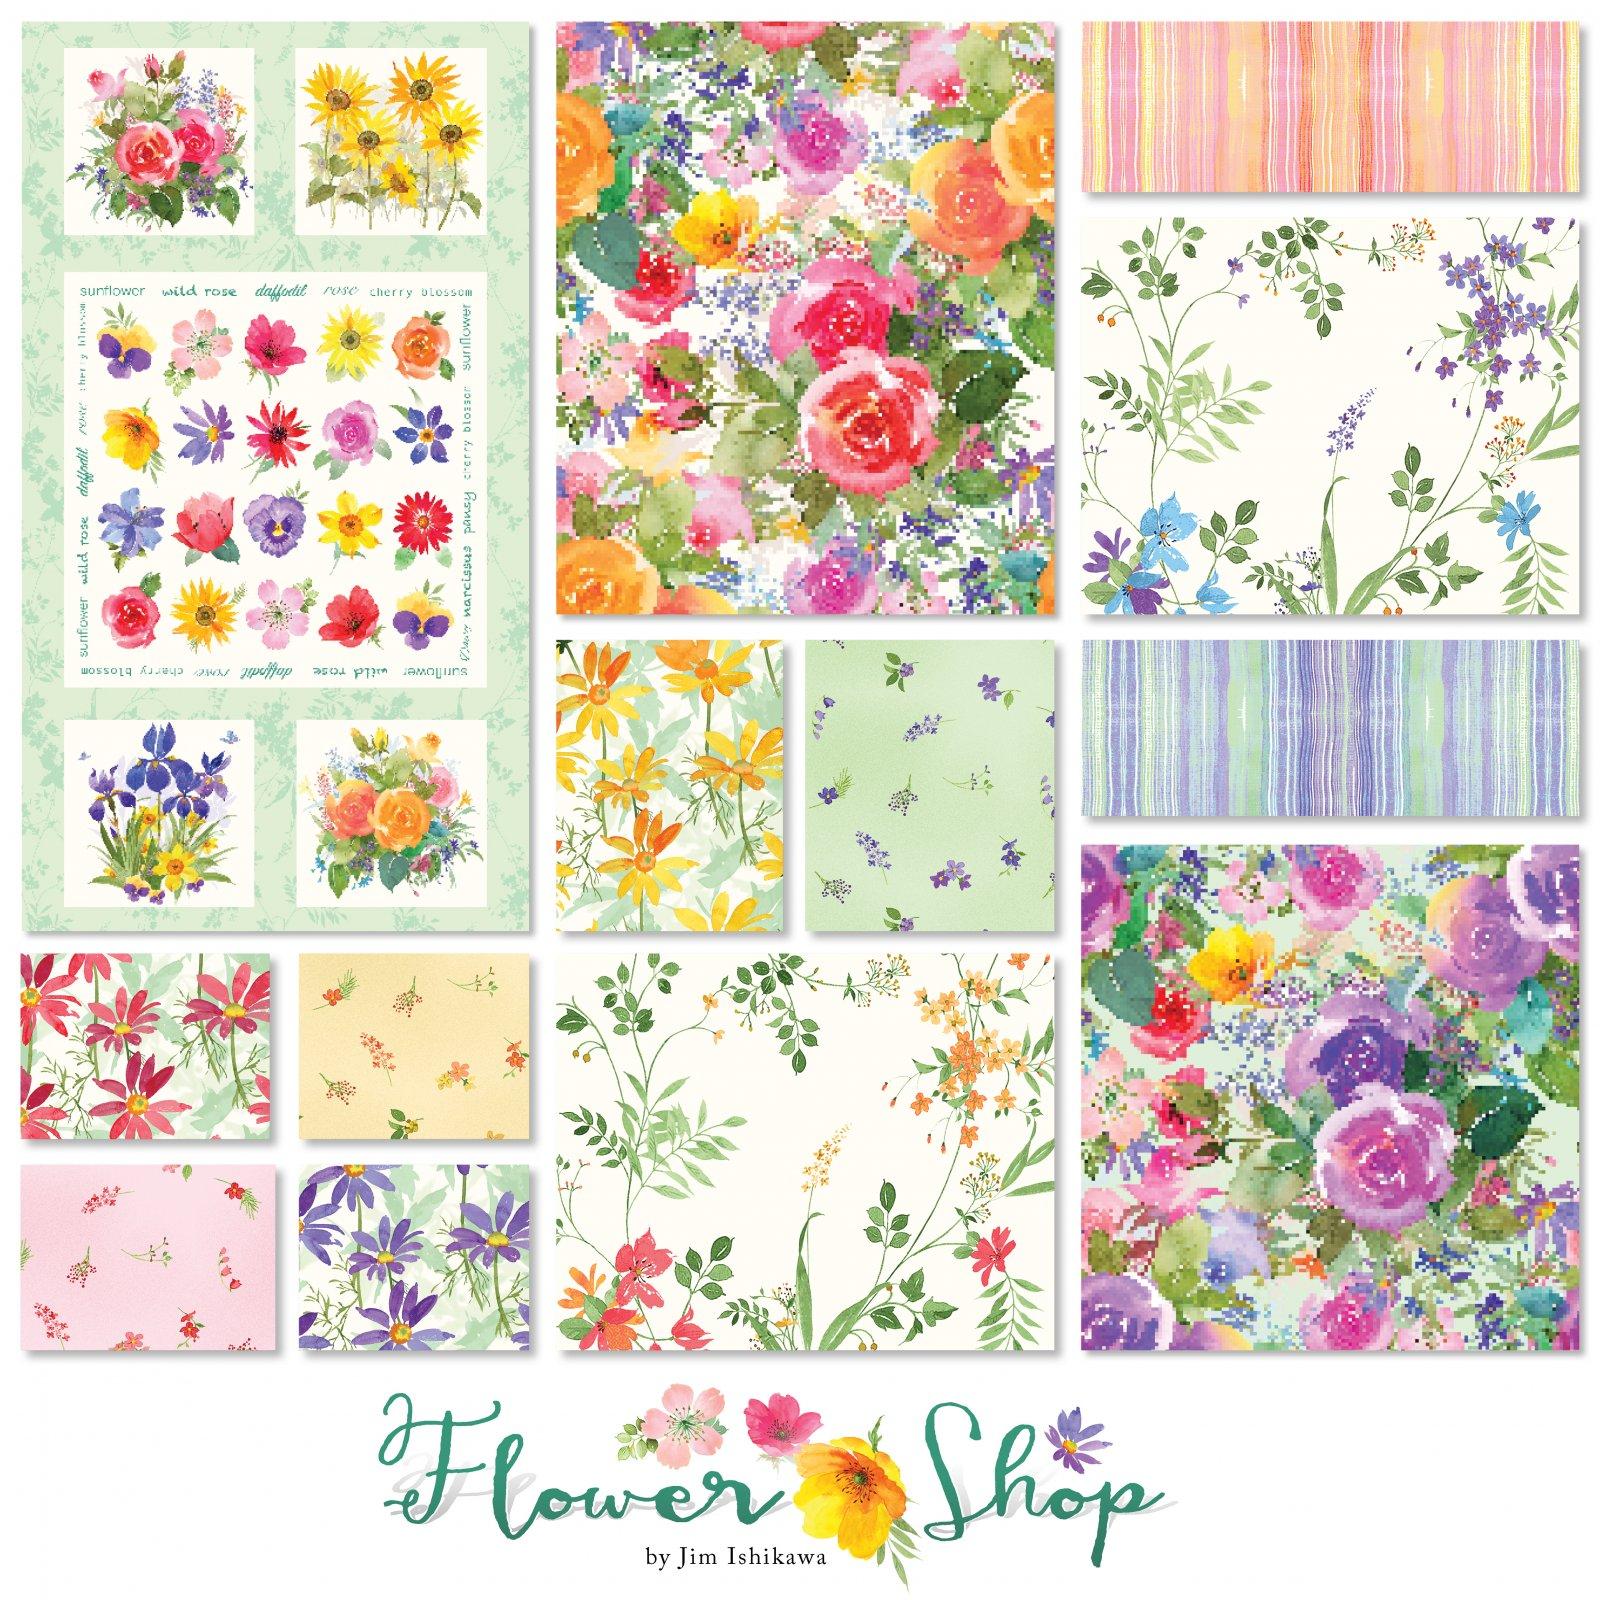 Flower Shop - 1 Panel and 12 Fat Quarters